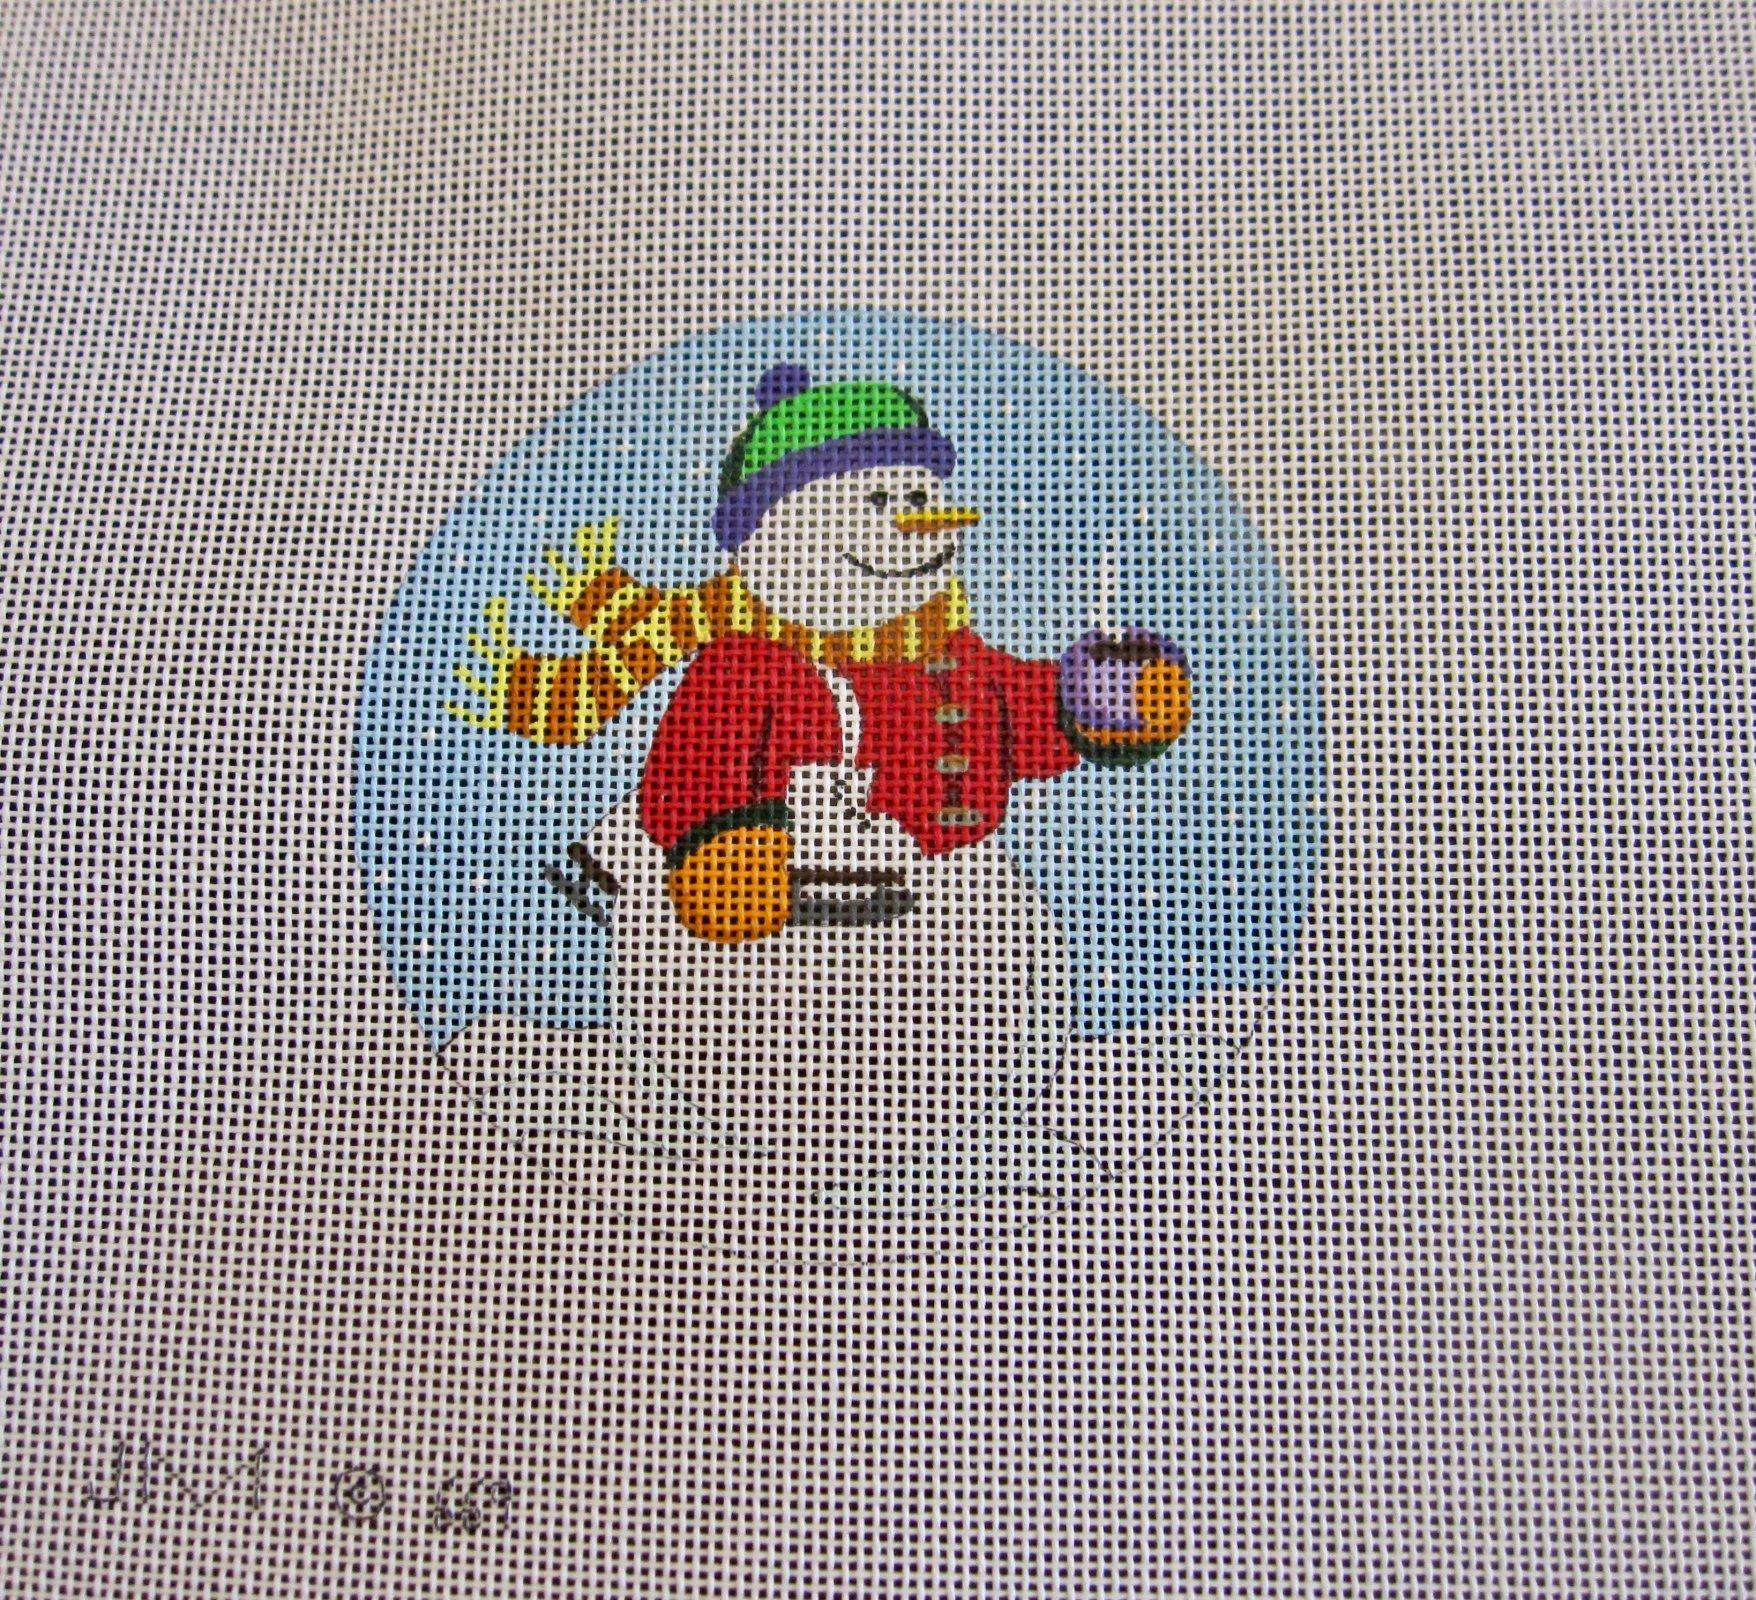 Snowman with Ice Skates